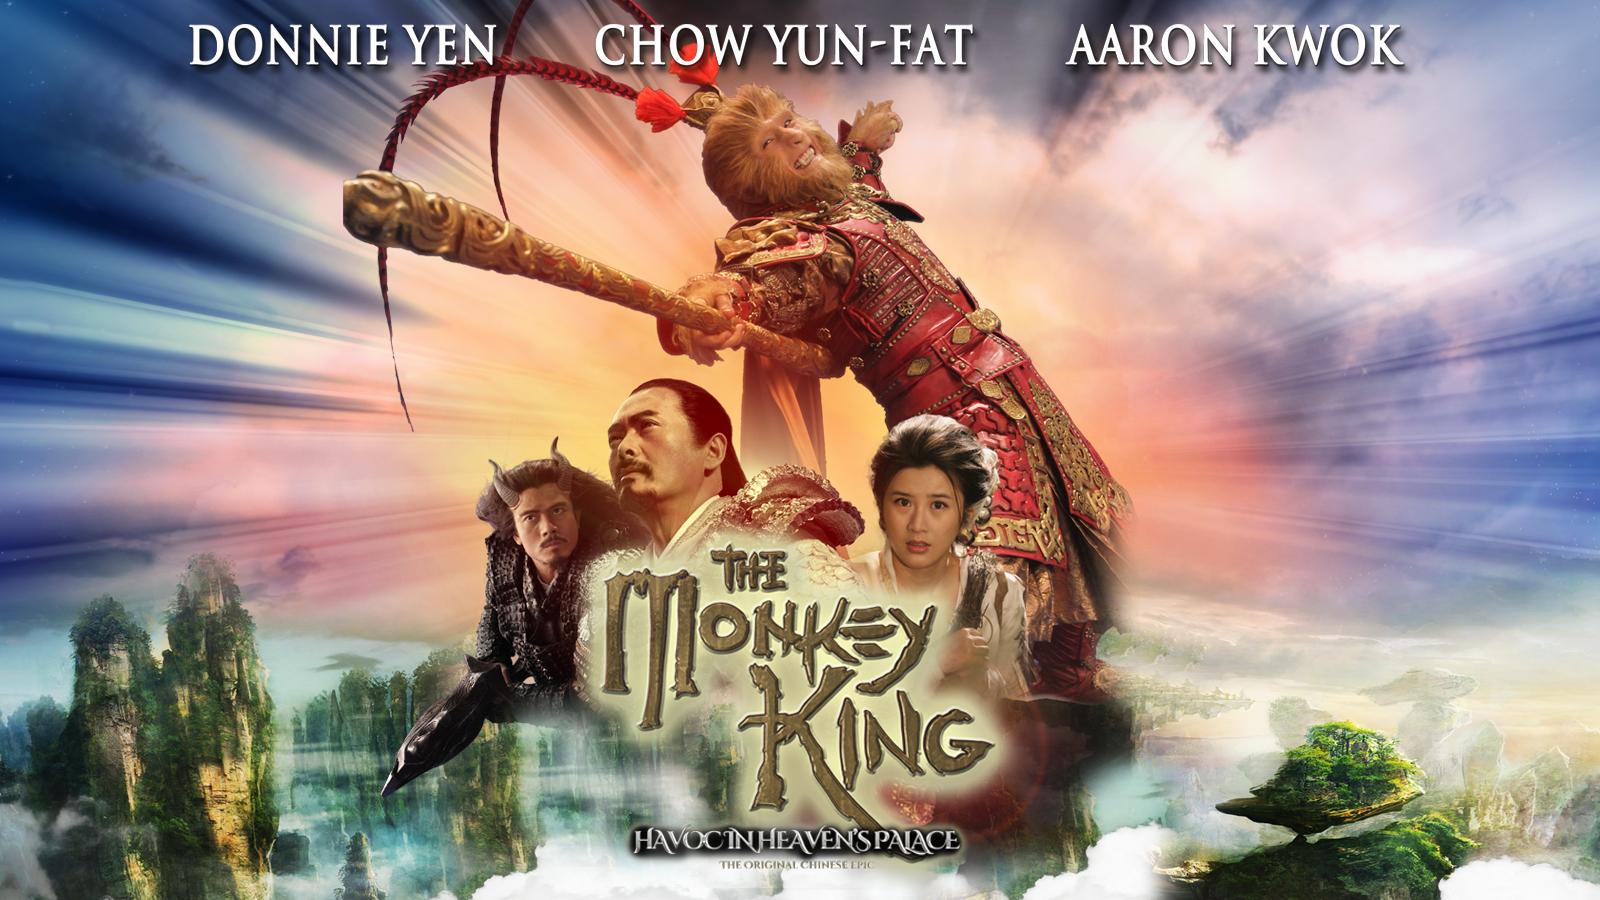 TheMonkeyKingHavocinHeavensPalace1600x900 poster